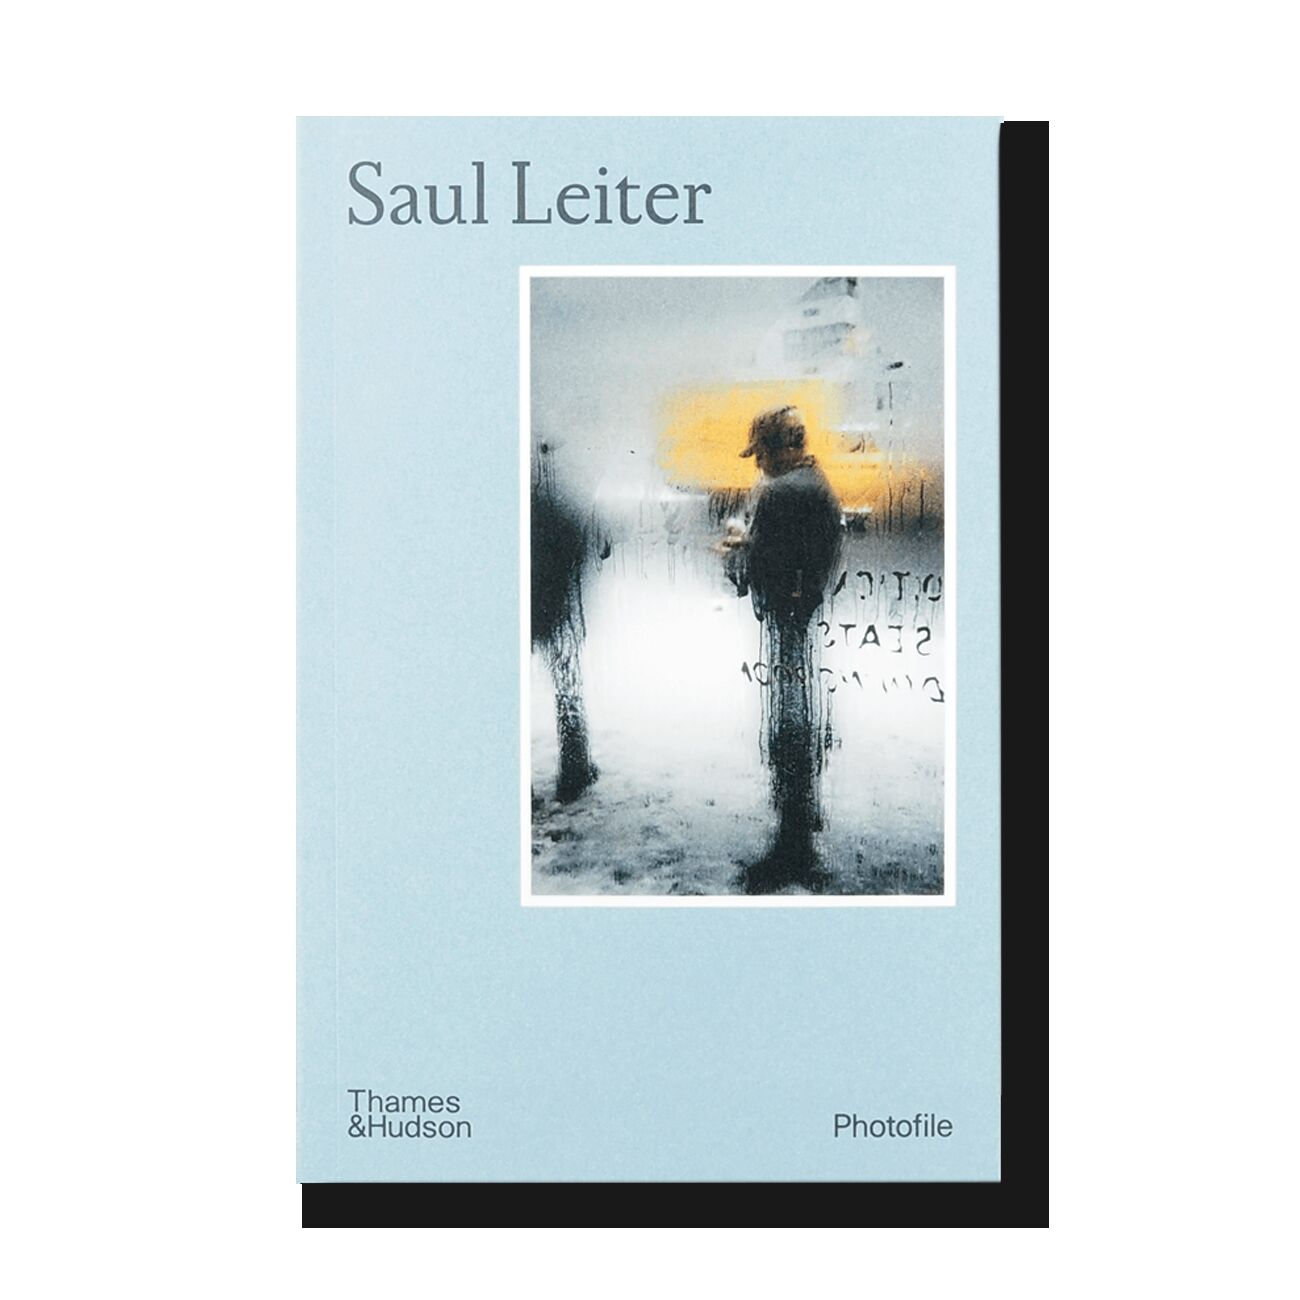 Saul Leiter (Photofile)